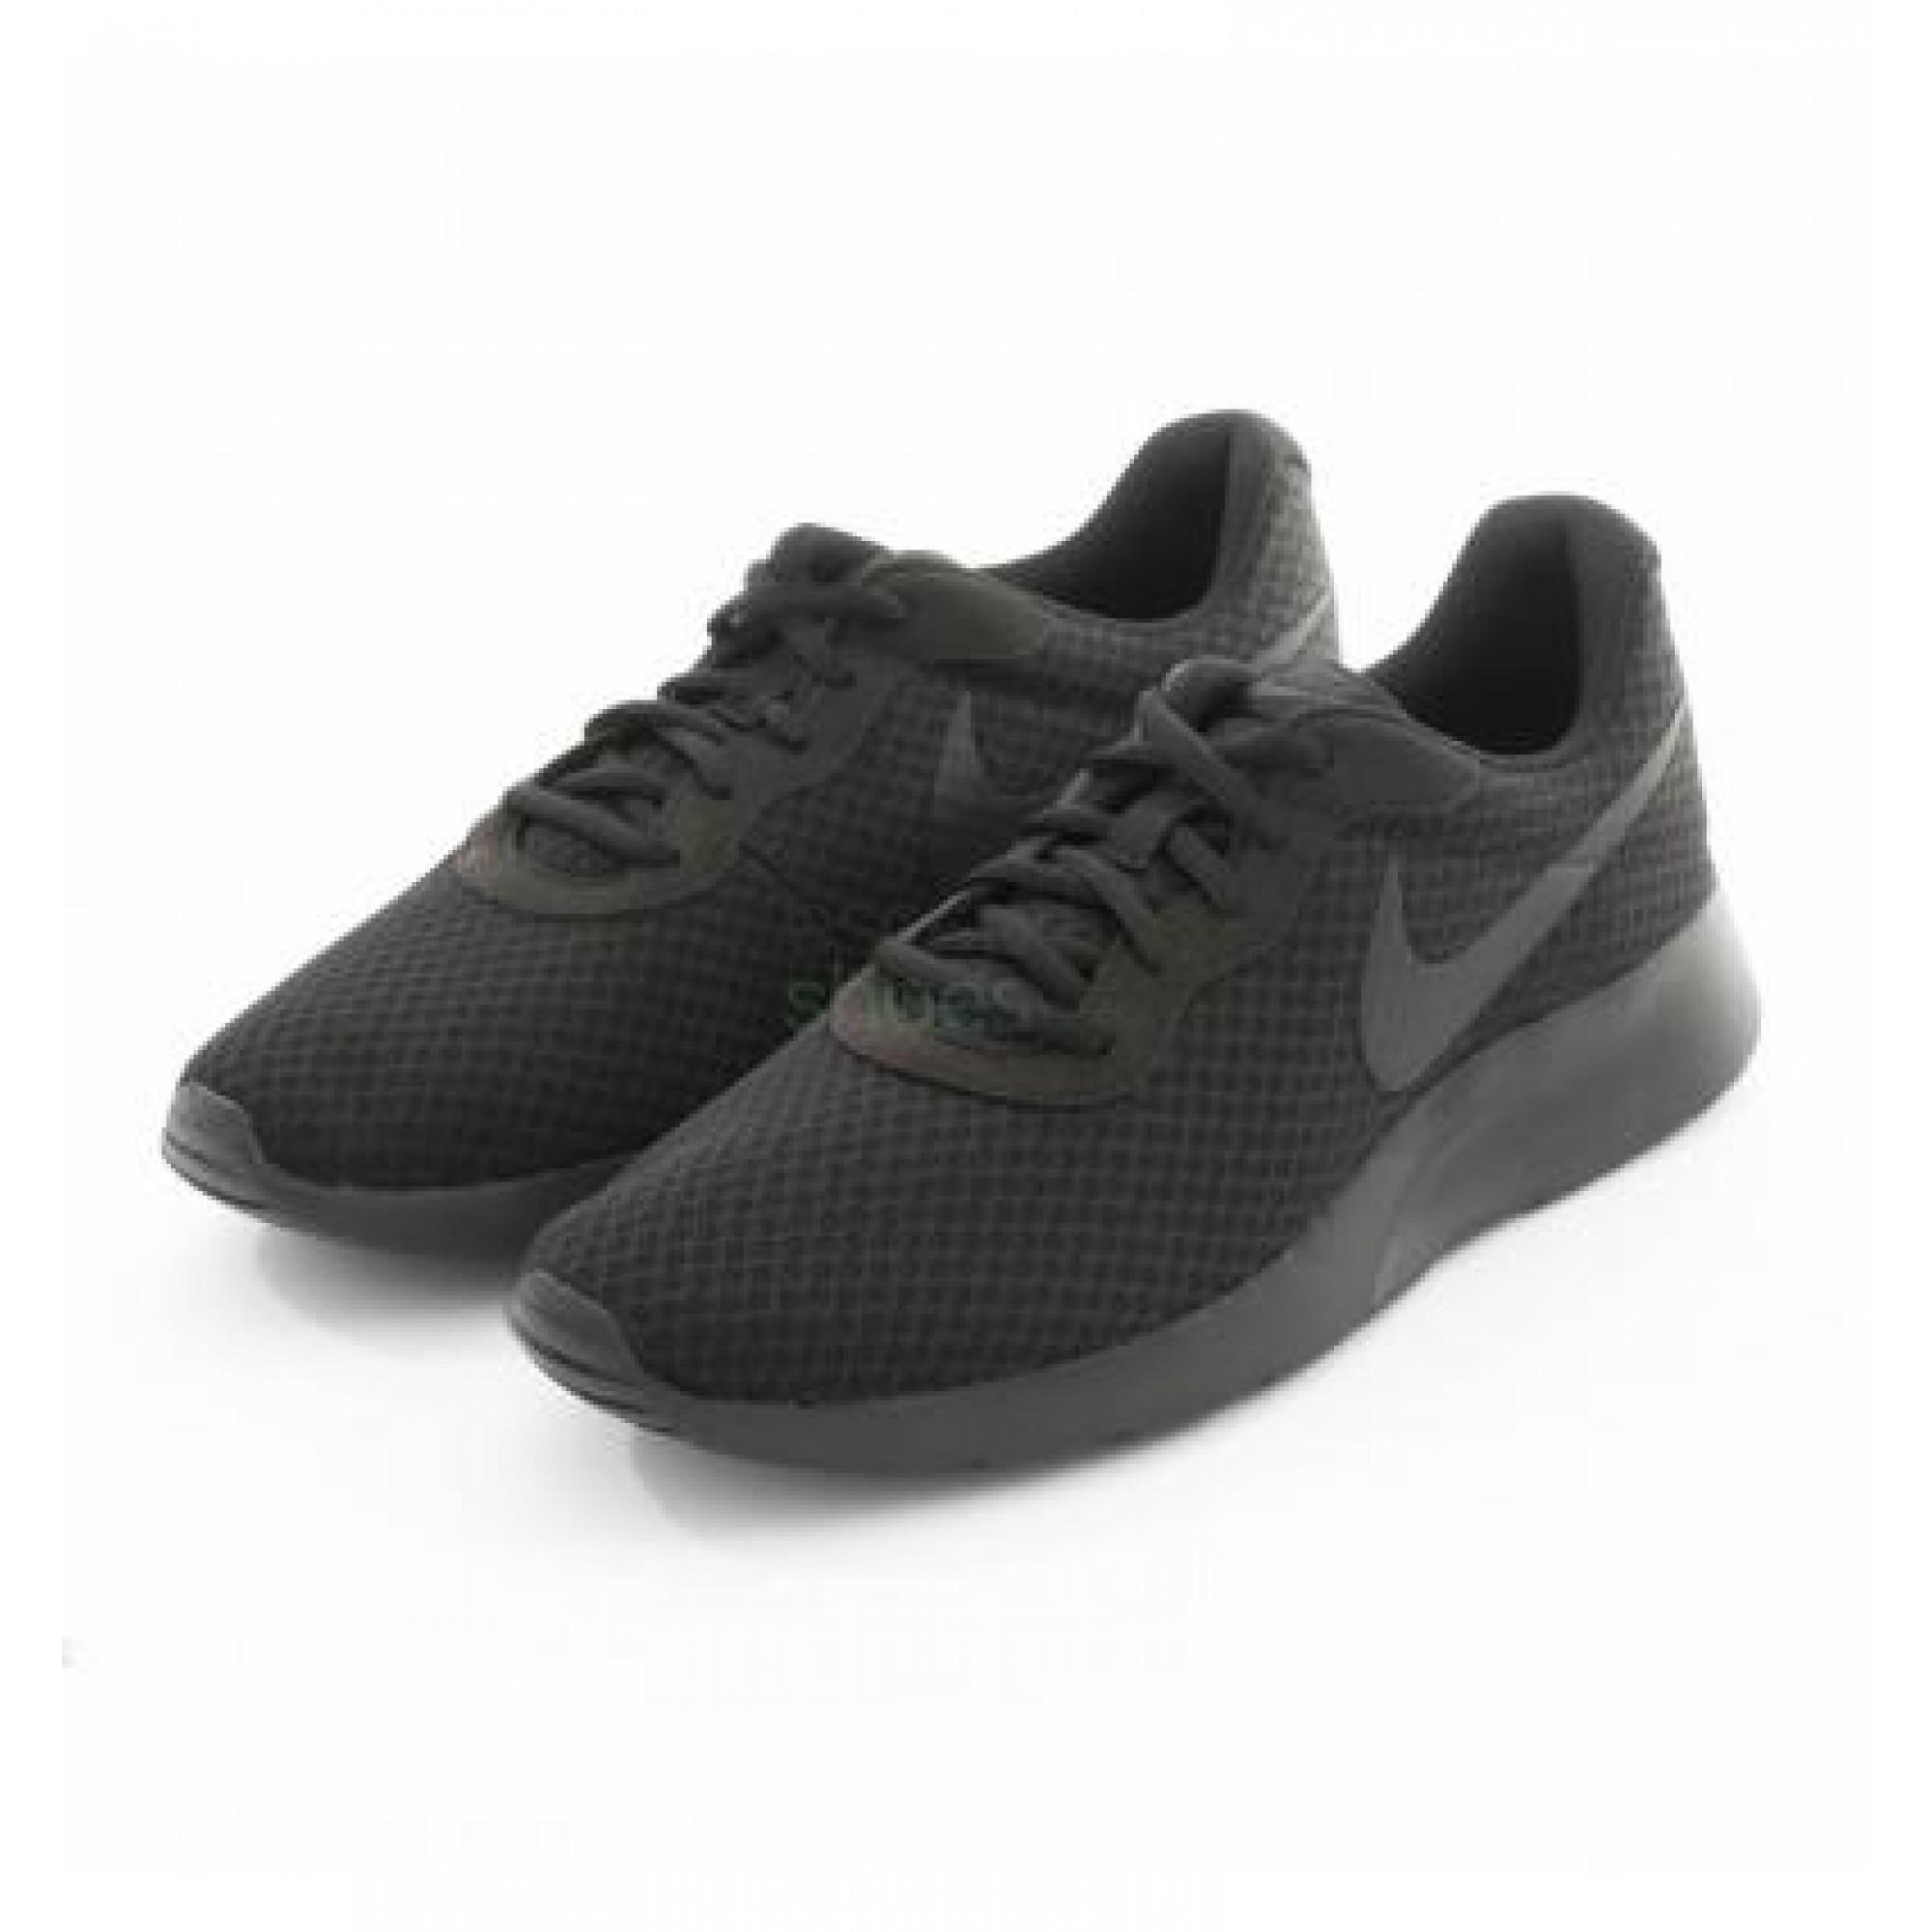 classic fit 23fa5 90a03 ... Men s Nike Tanjun Total Black 812654-001 Ανδρικό Μαύρο ...